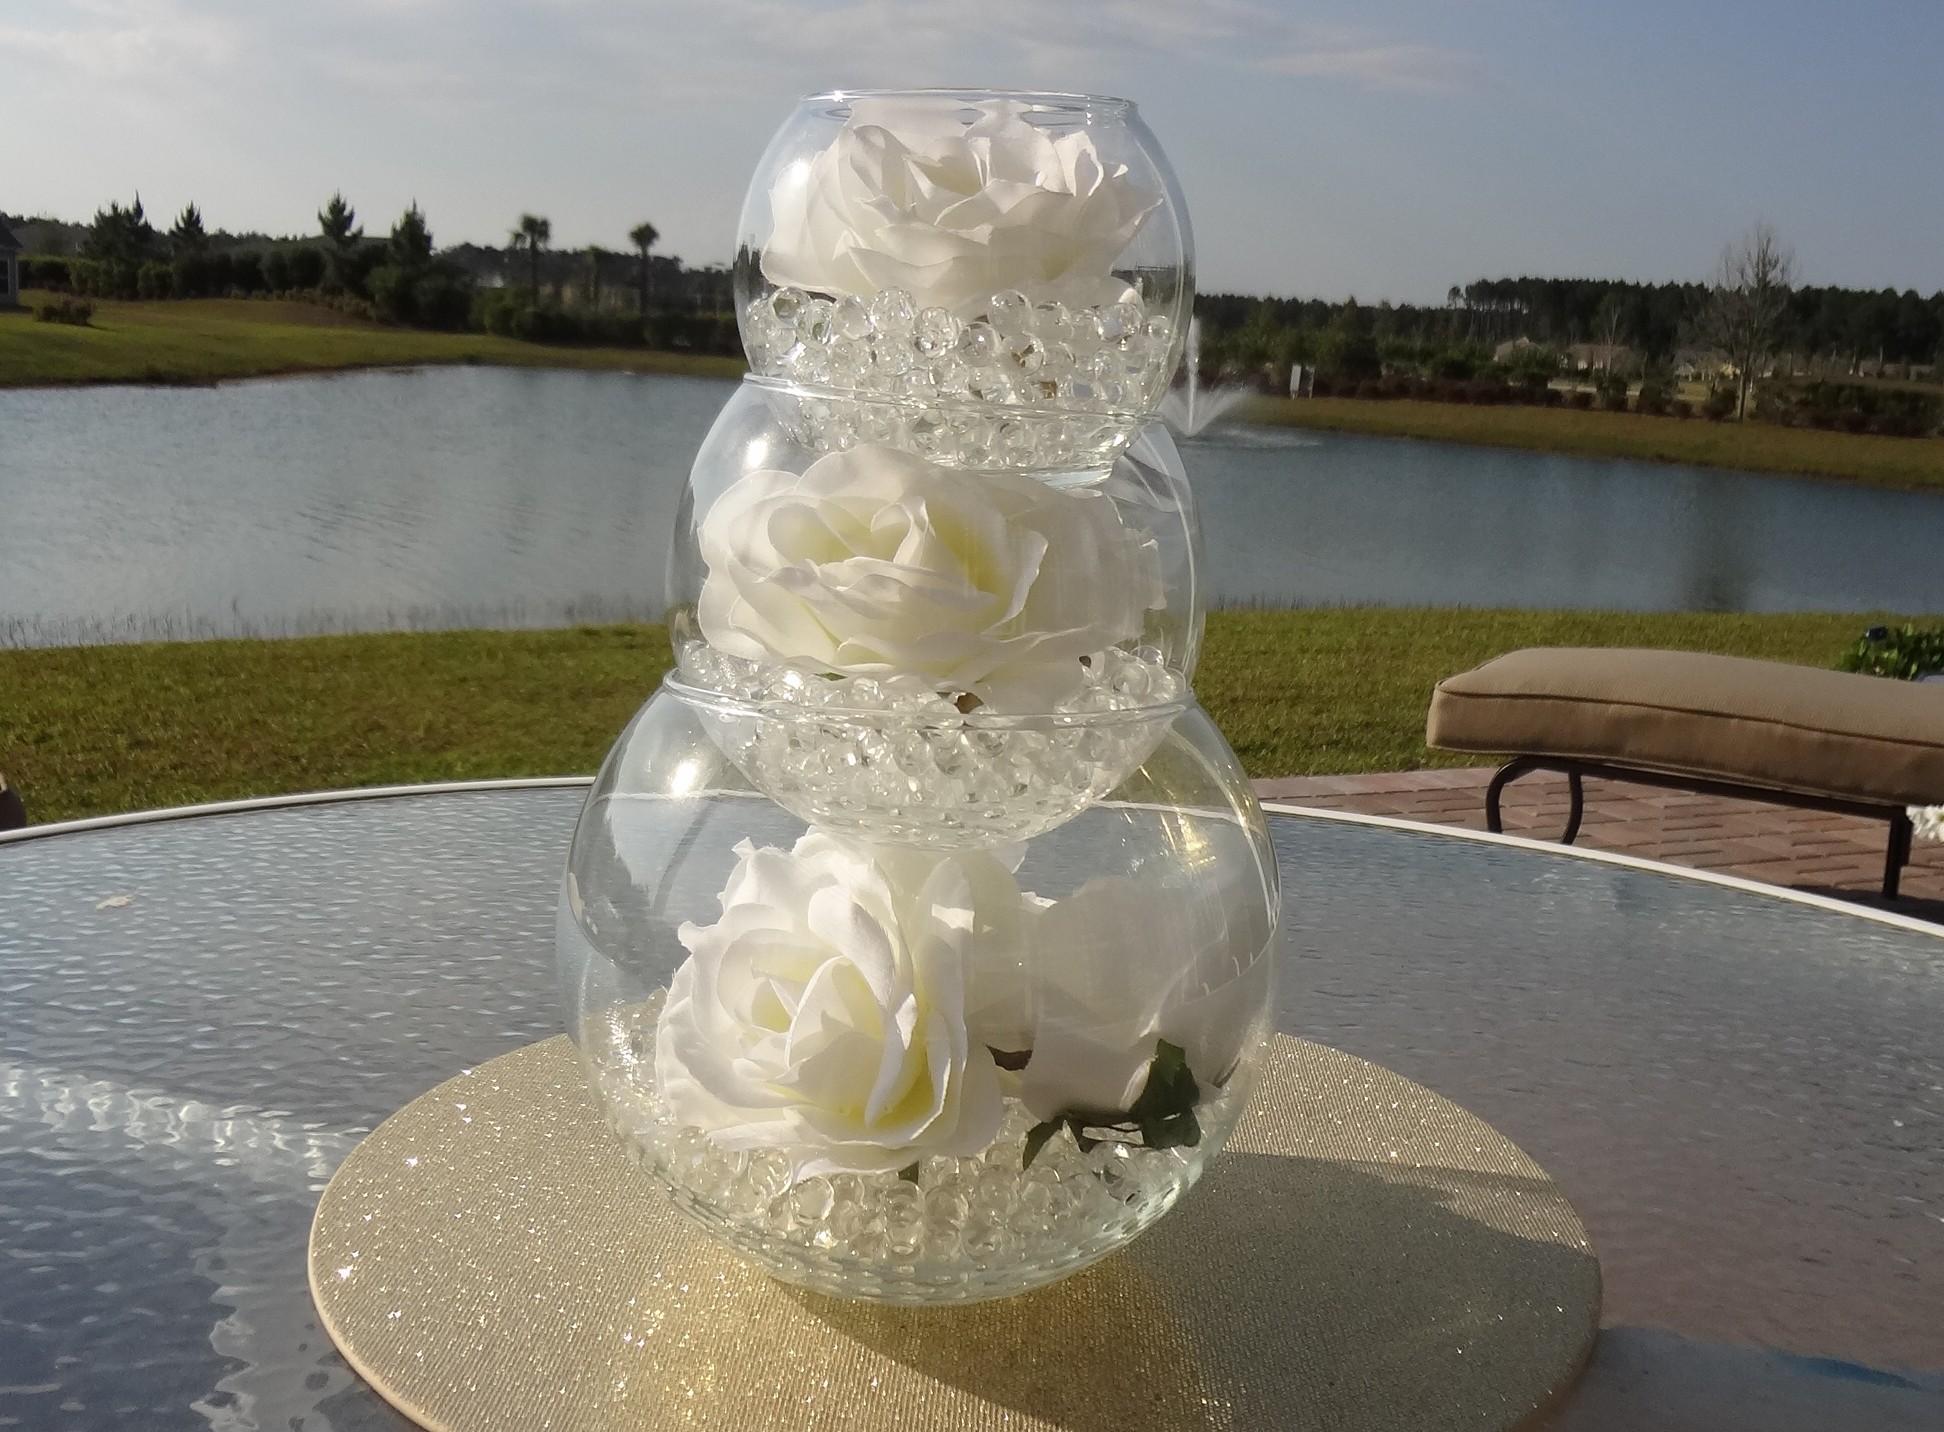 wedding centerpieces wedding centerpieces ideas Great wedding centerpiece idea